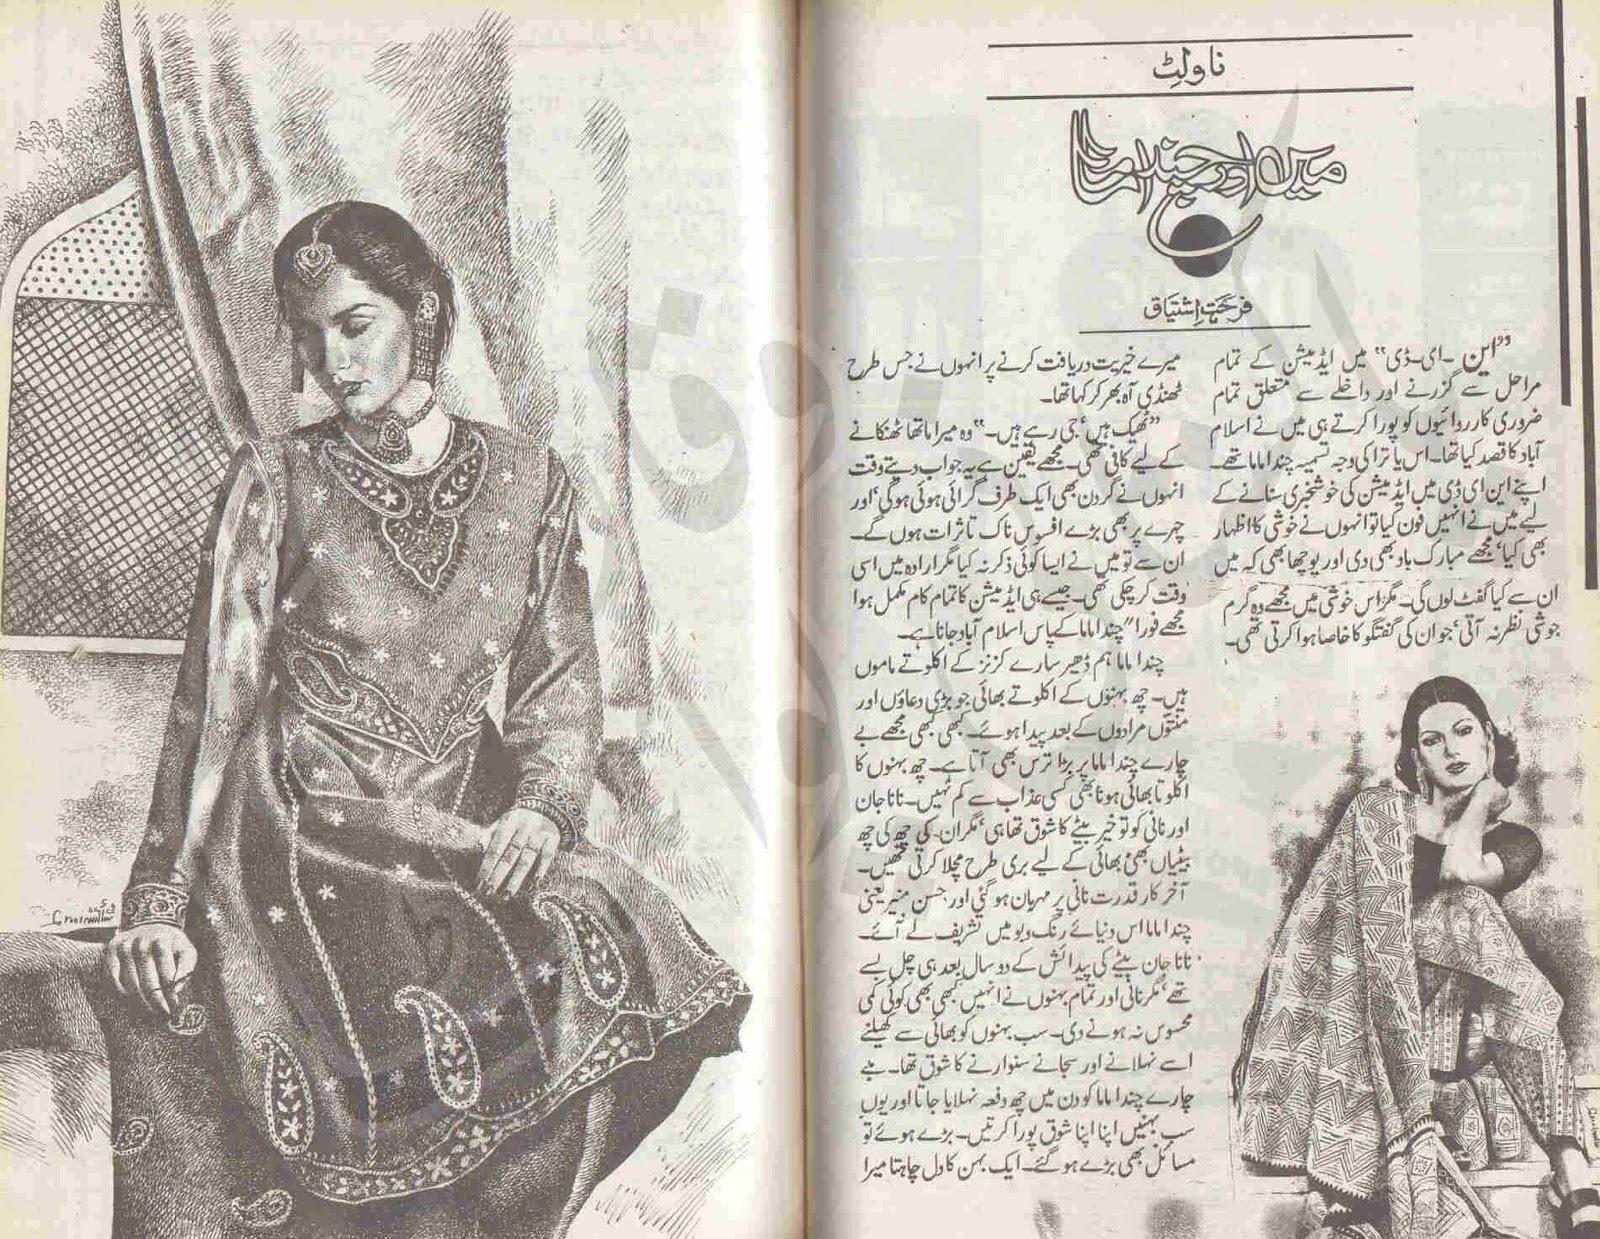 Me2Bor2Bchanda2Bmama2Bby2BFarhat2BIshtiaq page14 image1 - Main or Chanda Mama By Farhat Ishtiaq